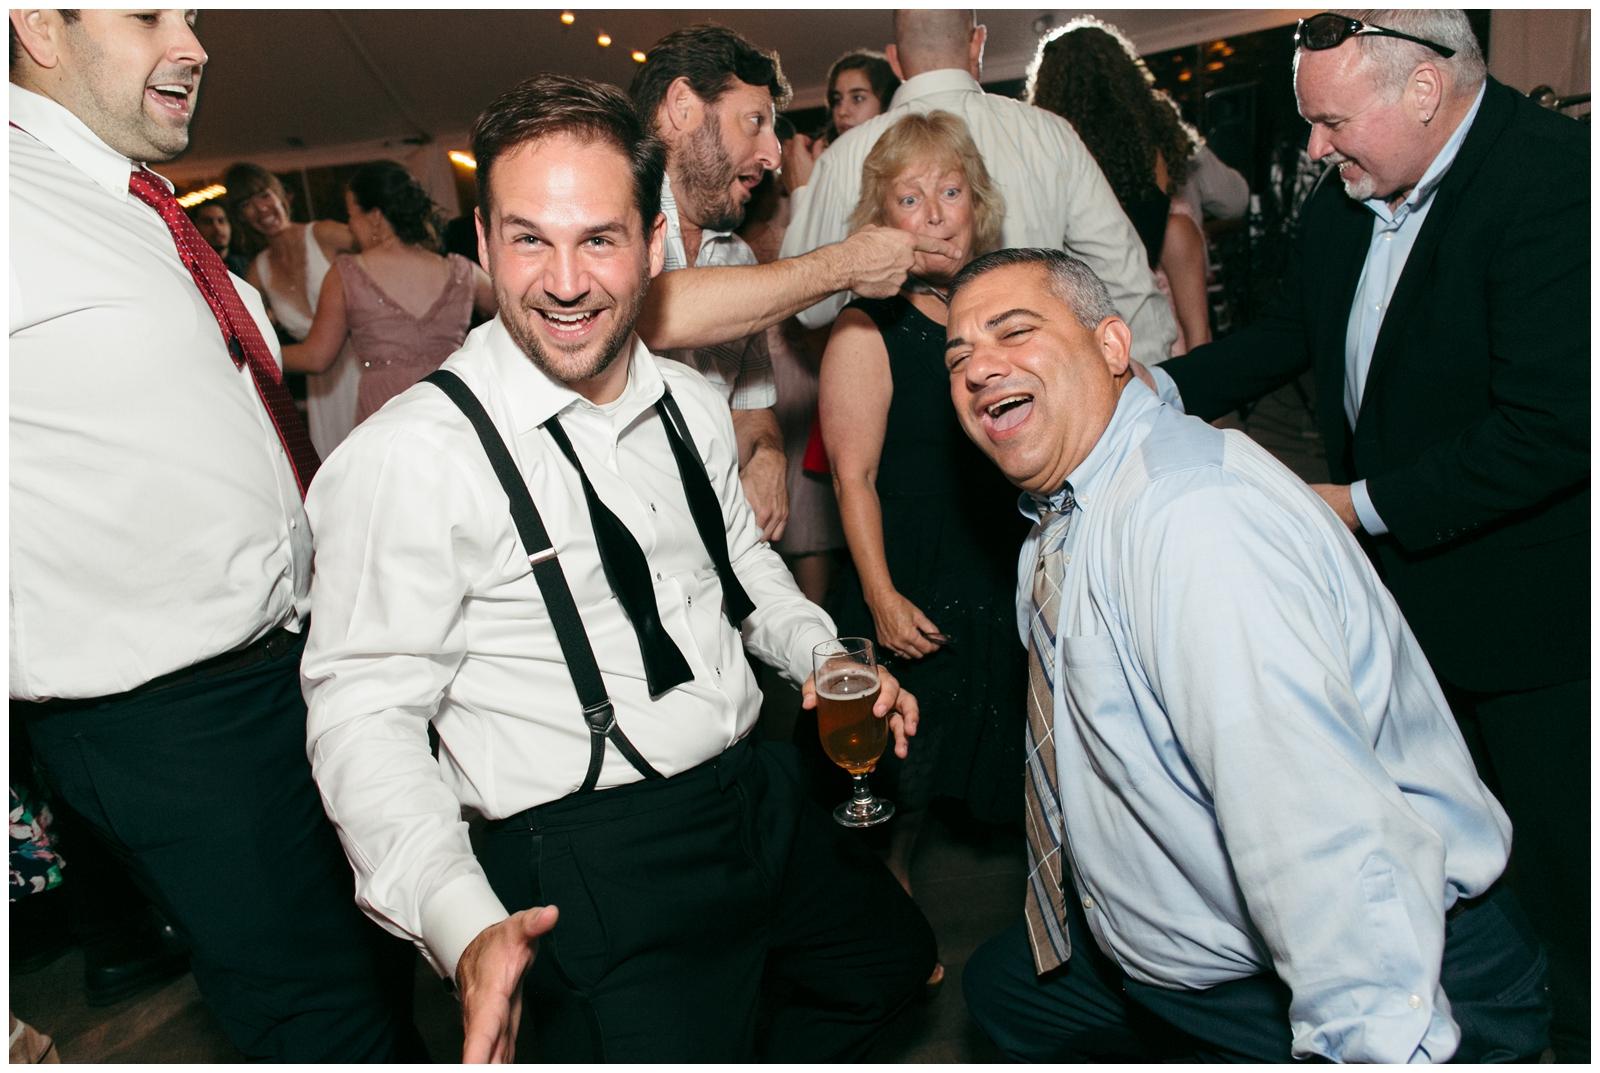 Moraine-Farm-wedding-Bailey-Q-Photo-Massachusetts-wedding-photpgrapher-170.jpg